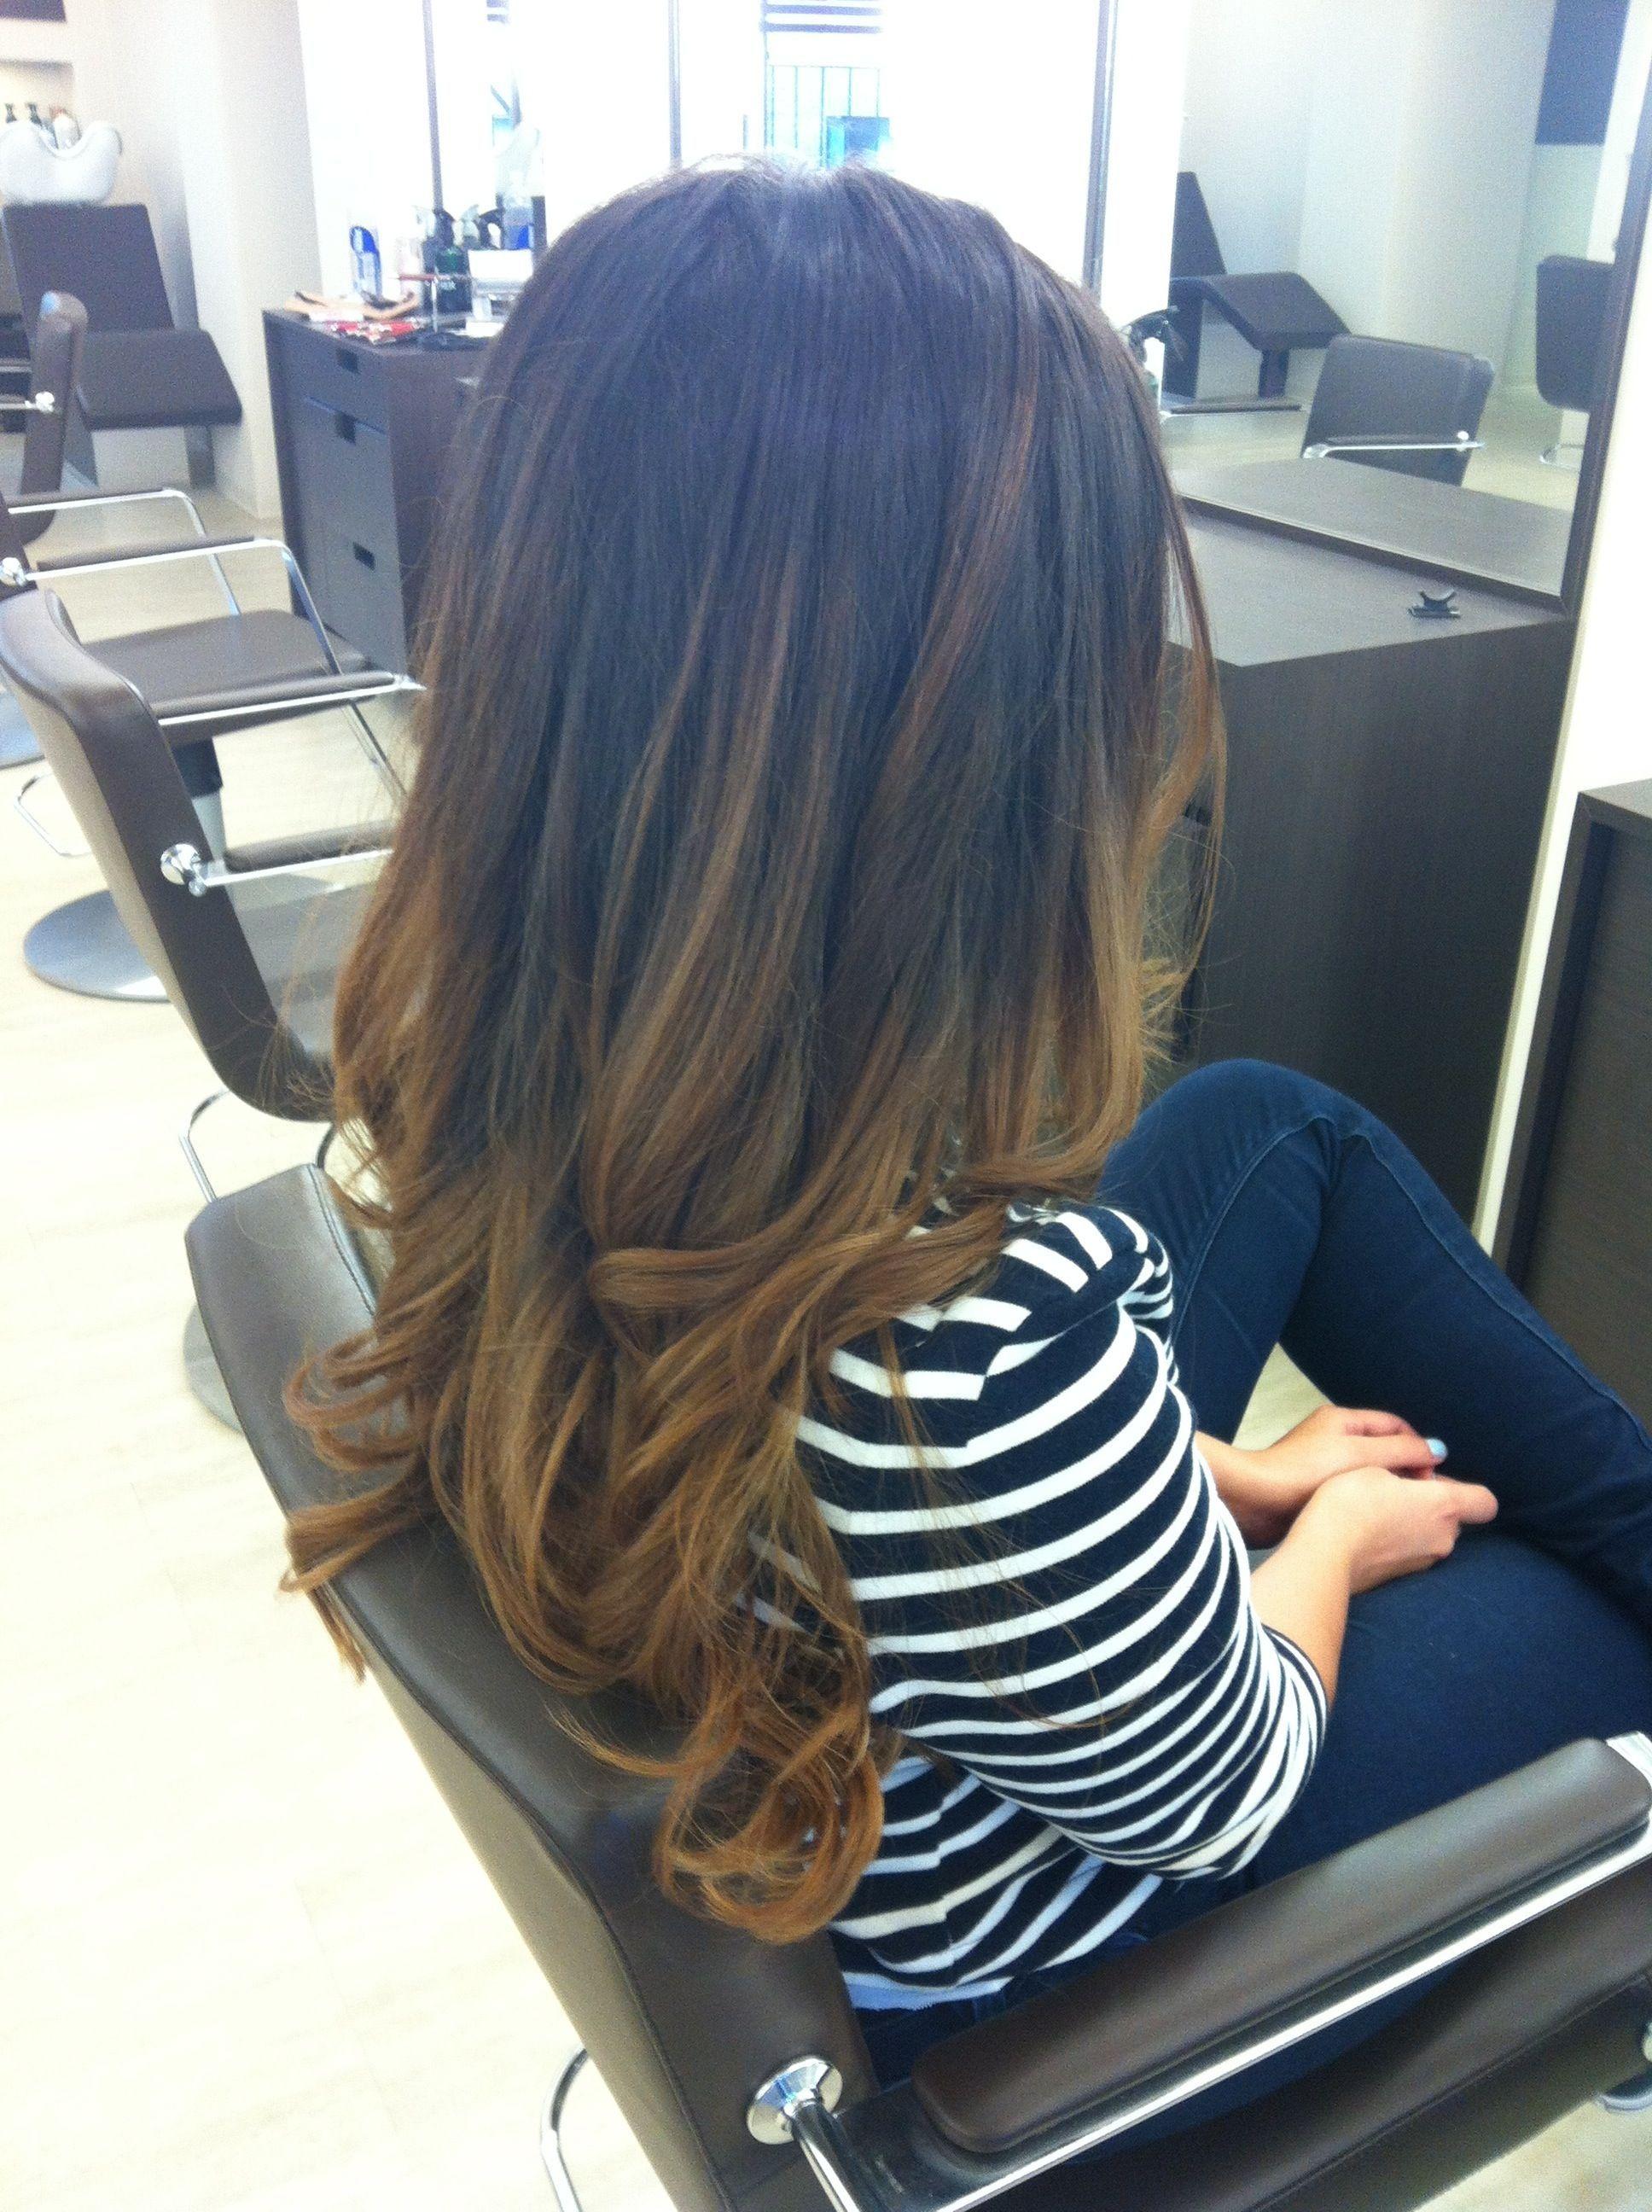 Long Hair Makeup Hair Extensions Beautiful Women Girls Ombre Hair Color Long Hair Styles Hair Styles